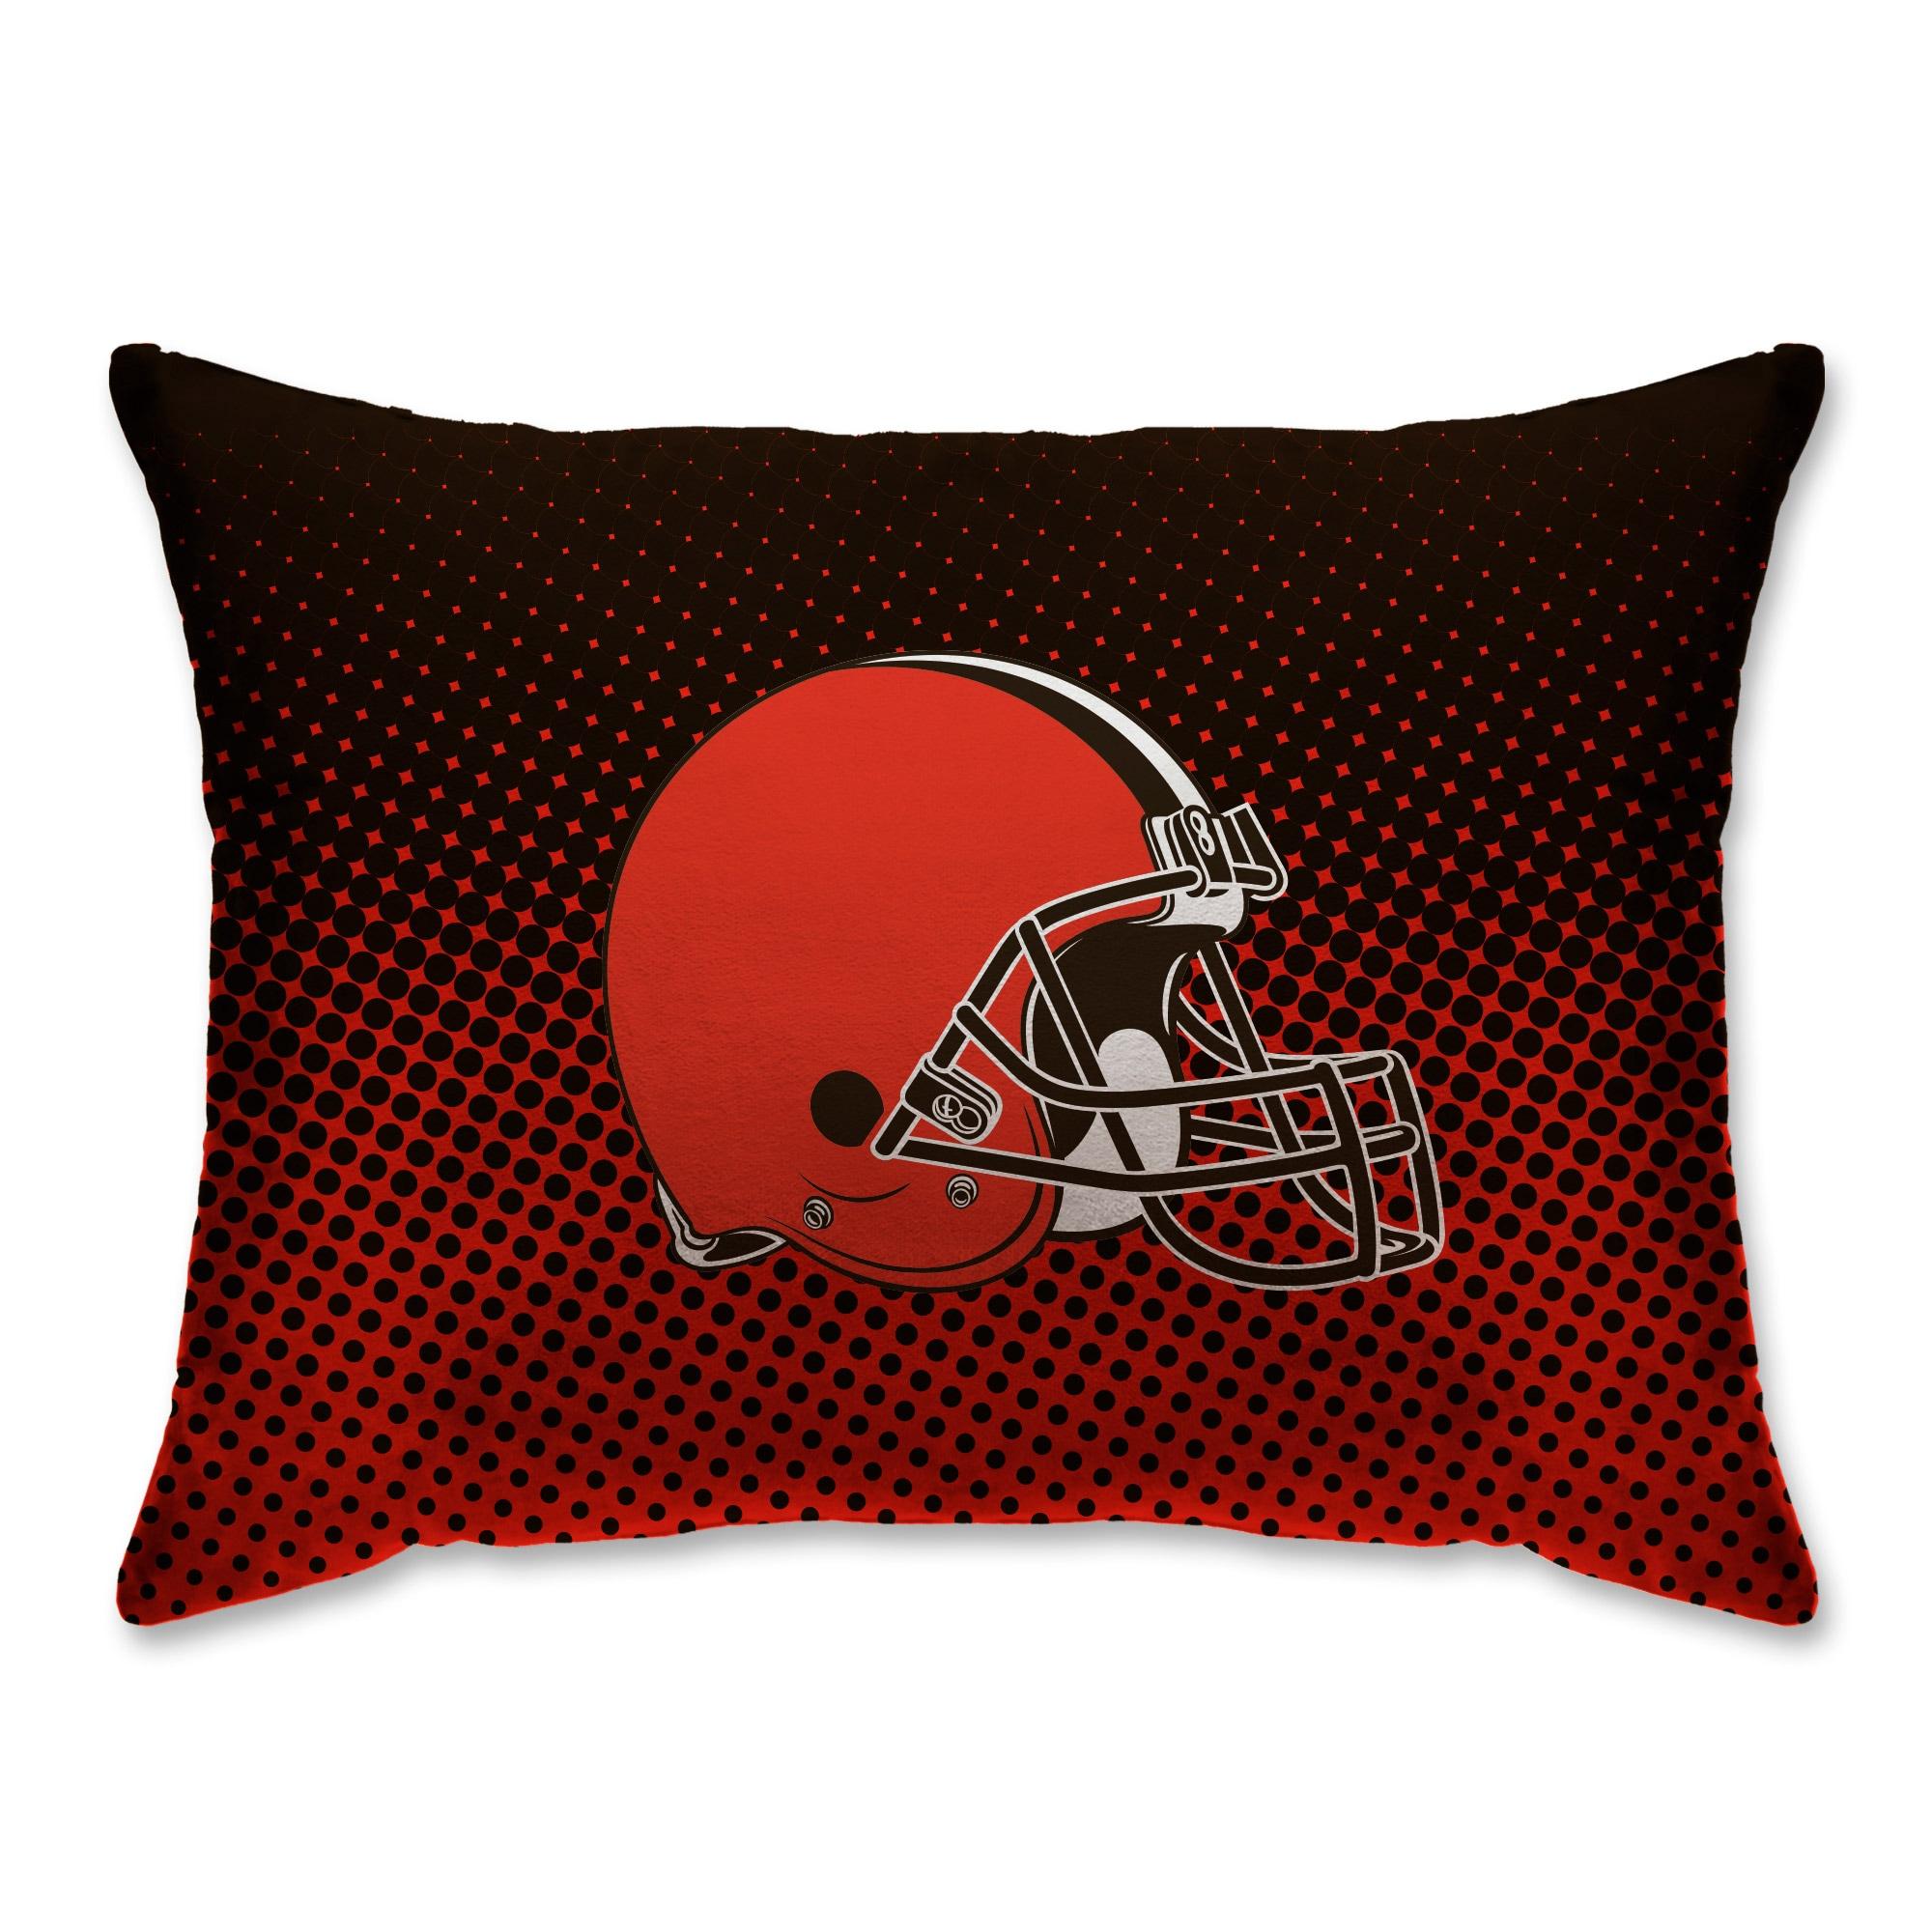 "Cleveland Browns 20"" x 26"" Dot Decorative Bed Pillow"